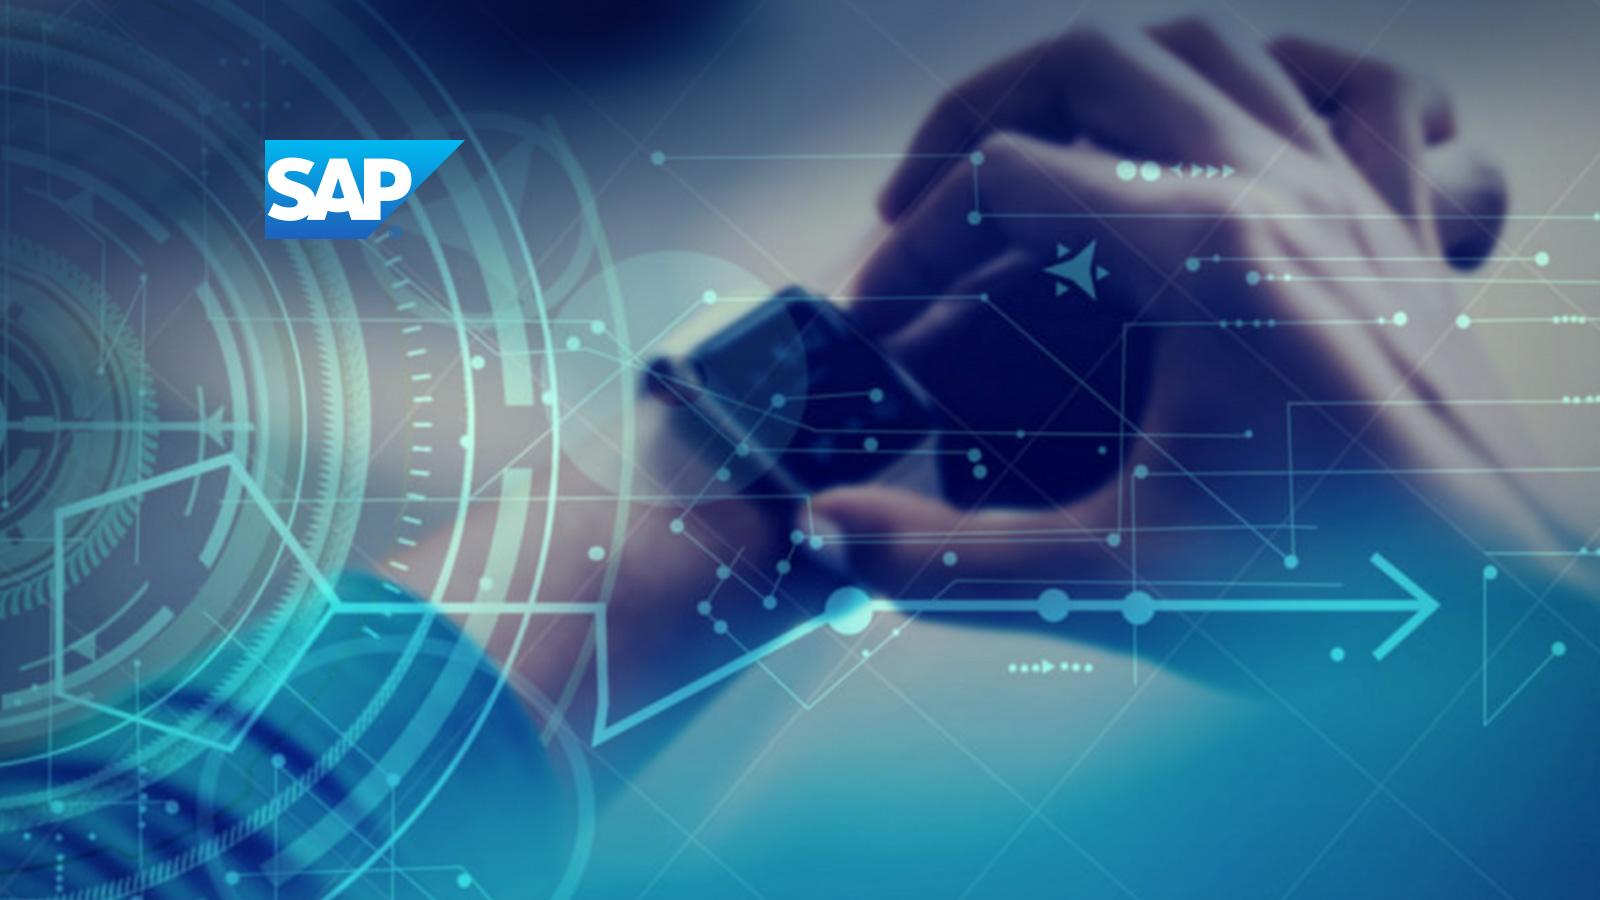 Record Number of SAP SuccessFactors Customers Adopt Revolutionary 1600x900